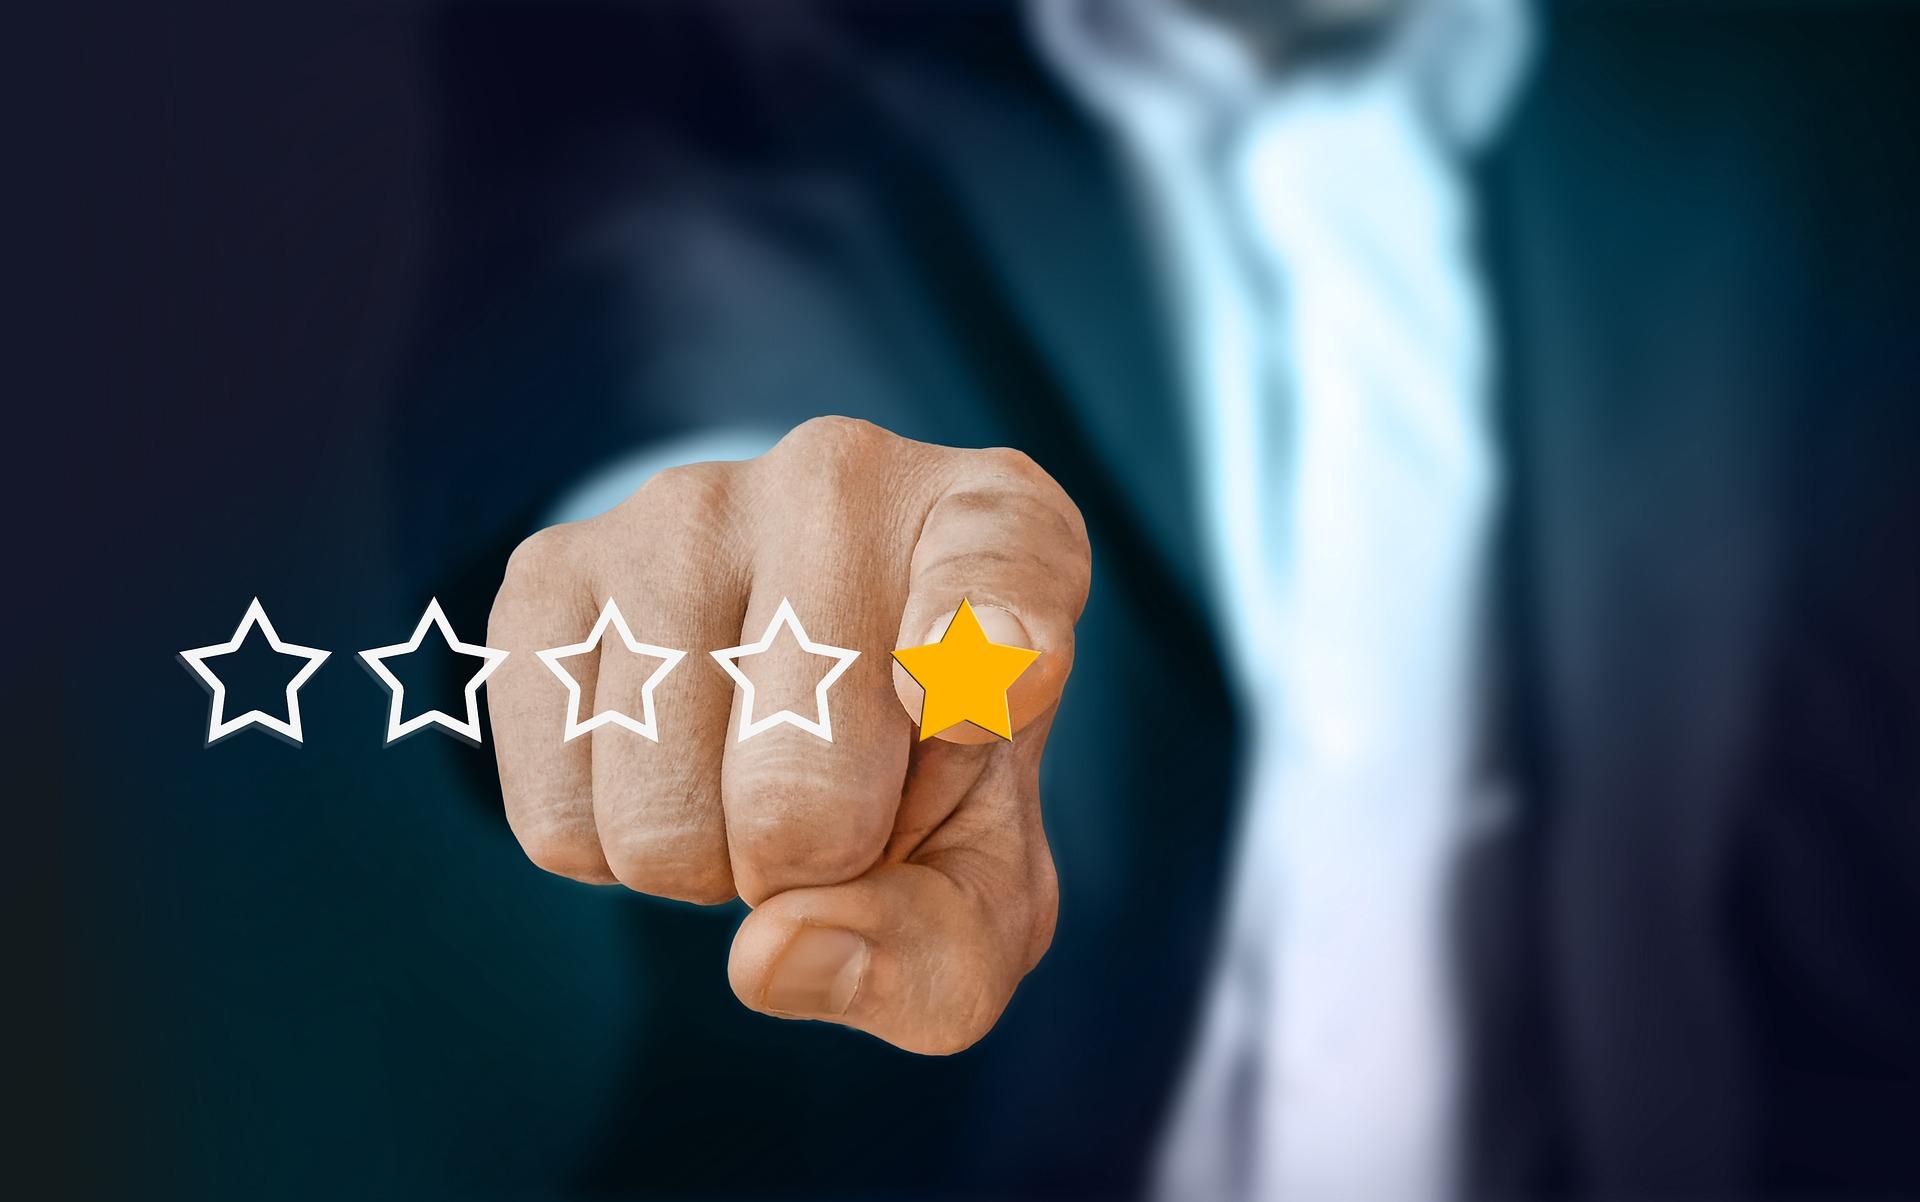 Is Analysevt Site a Scam or Untrustworthy Online Shop?